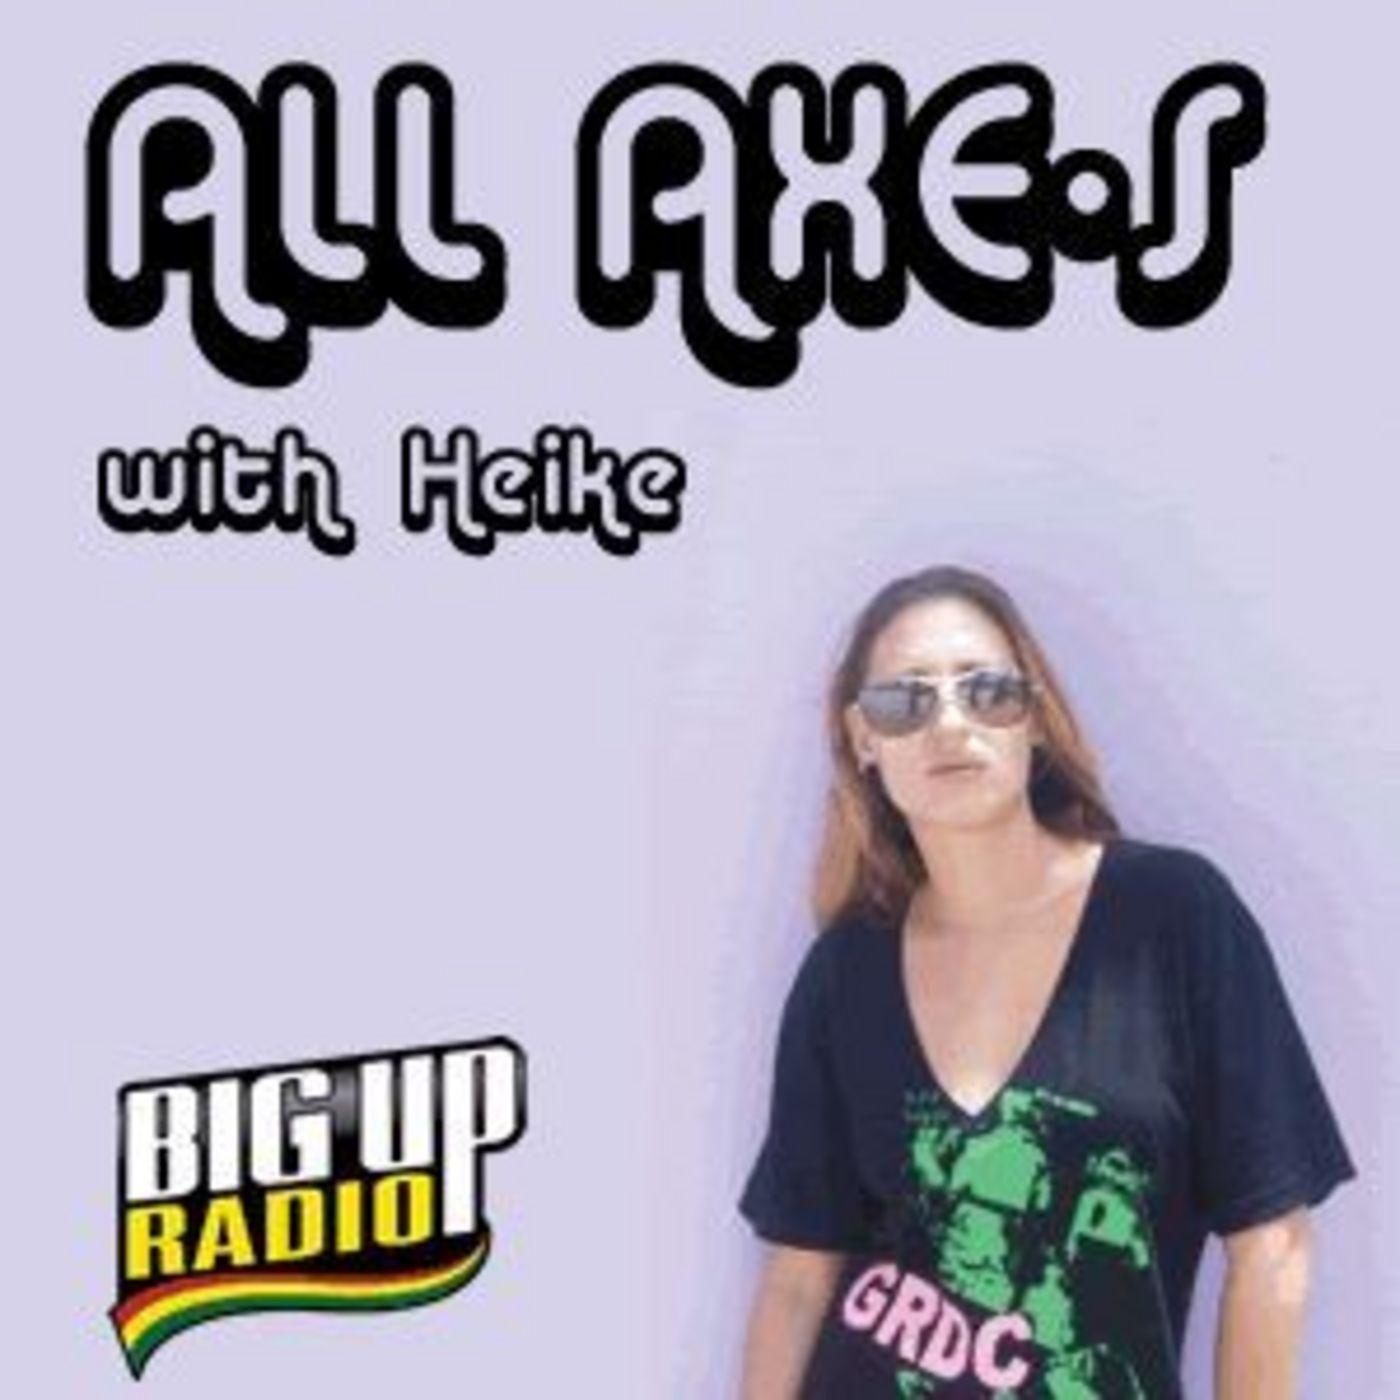 <![CDATA[Bigupradio.com All AXE-S Dancehall Reggae Show]]>